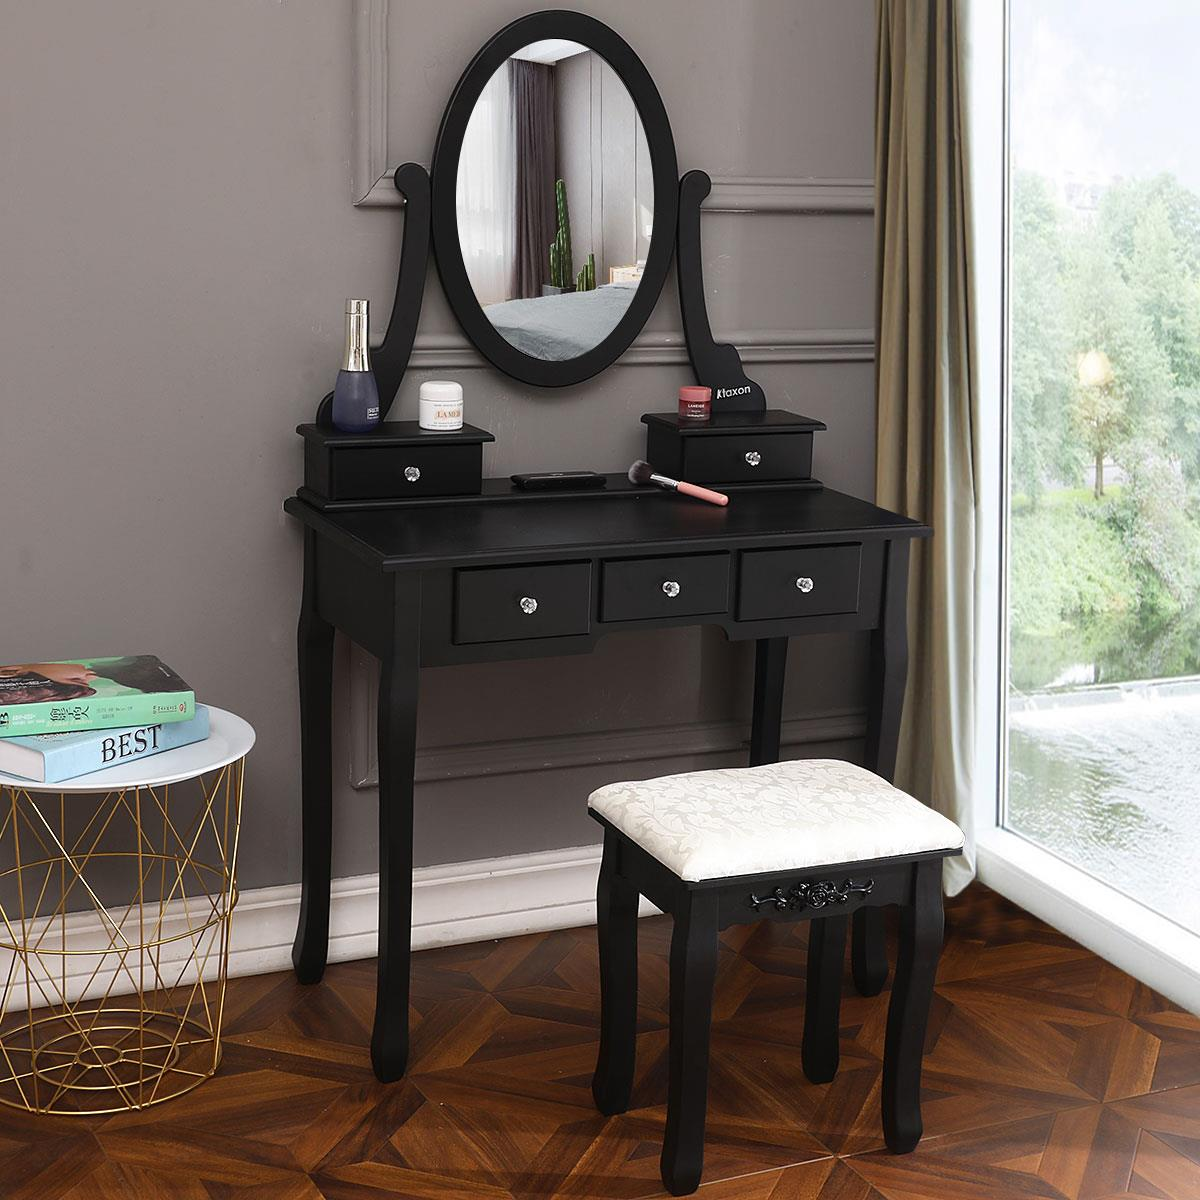 Ktaxon Vanity Makeup Dressing Table Set W Stool 5 Drawers Amp Oval Mirror Jewelry Desk Black